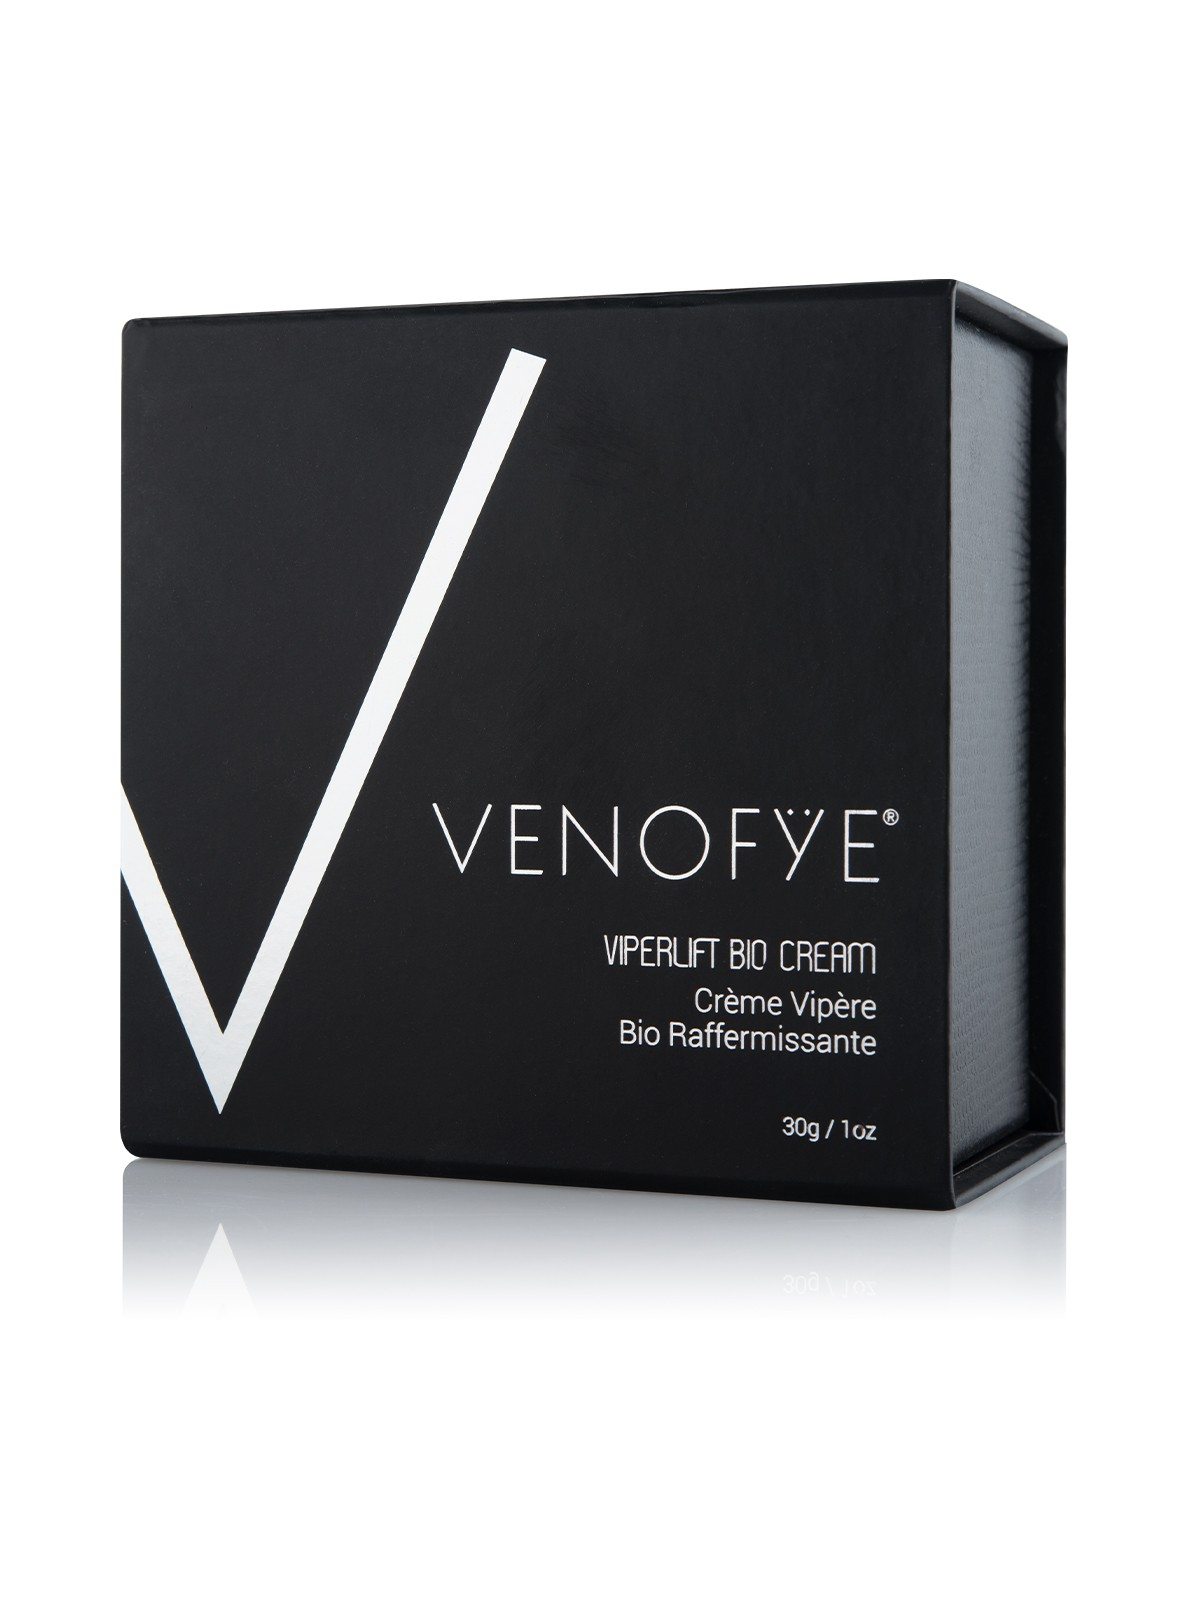 ViperLift Bio Cream in its case